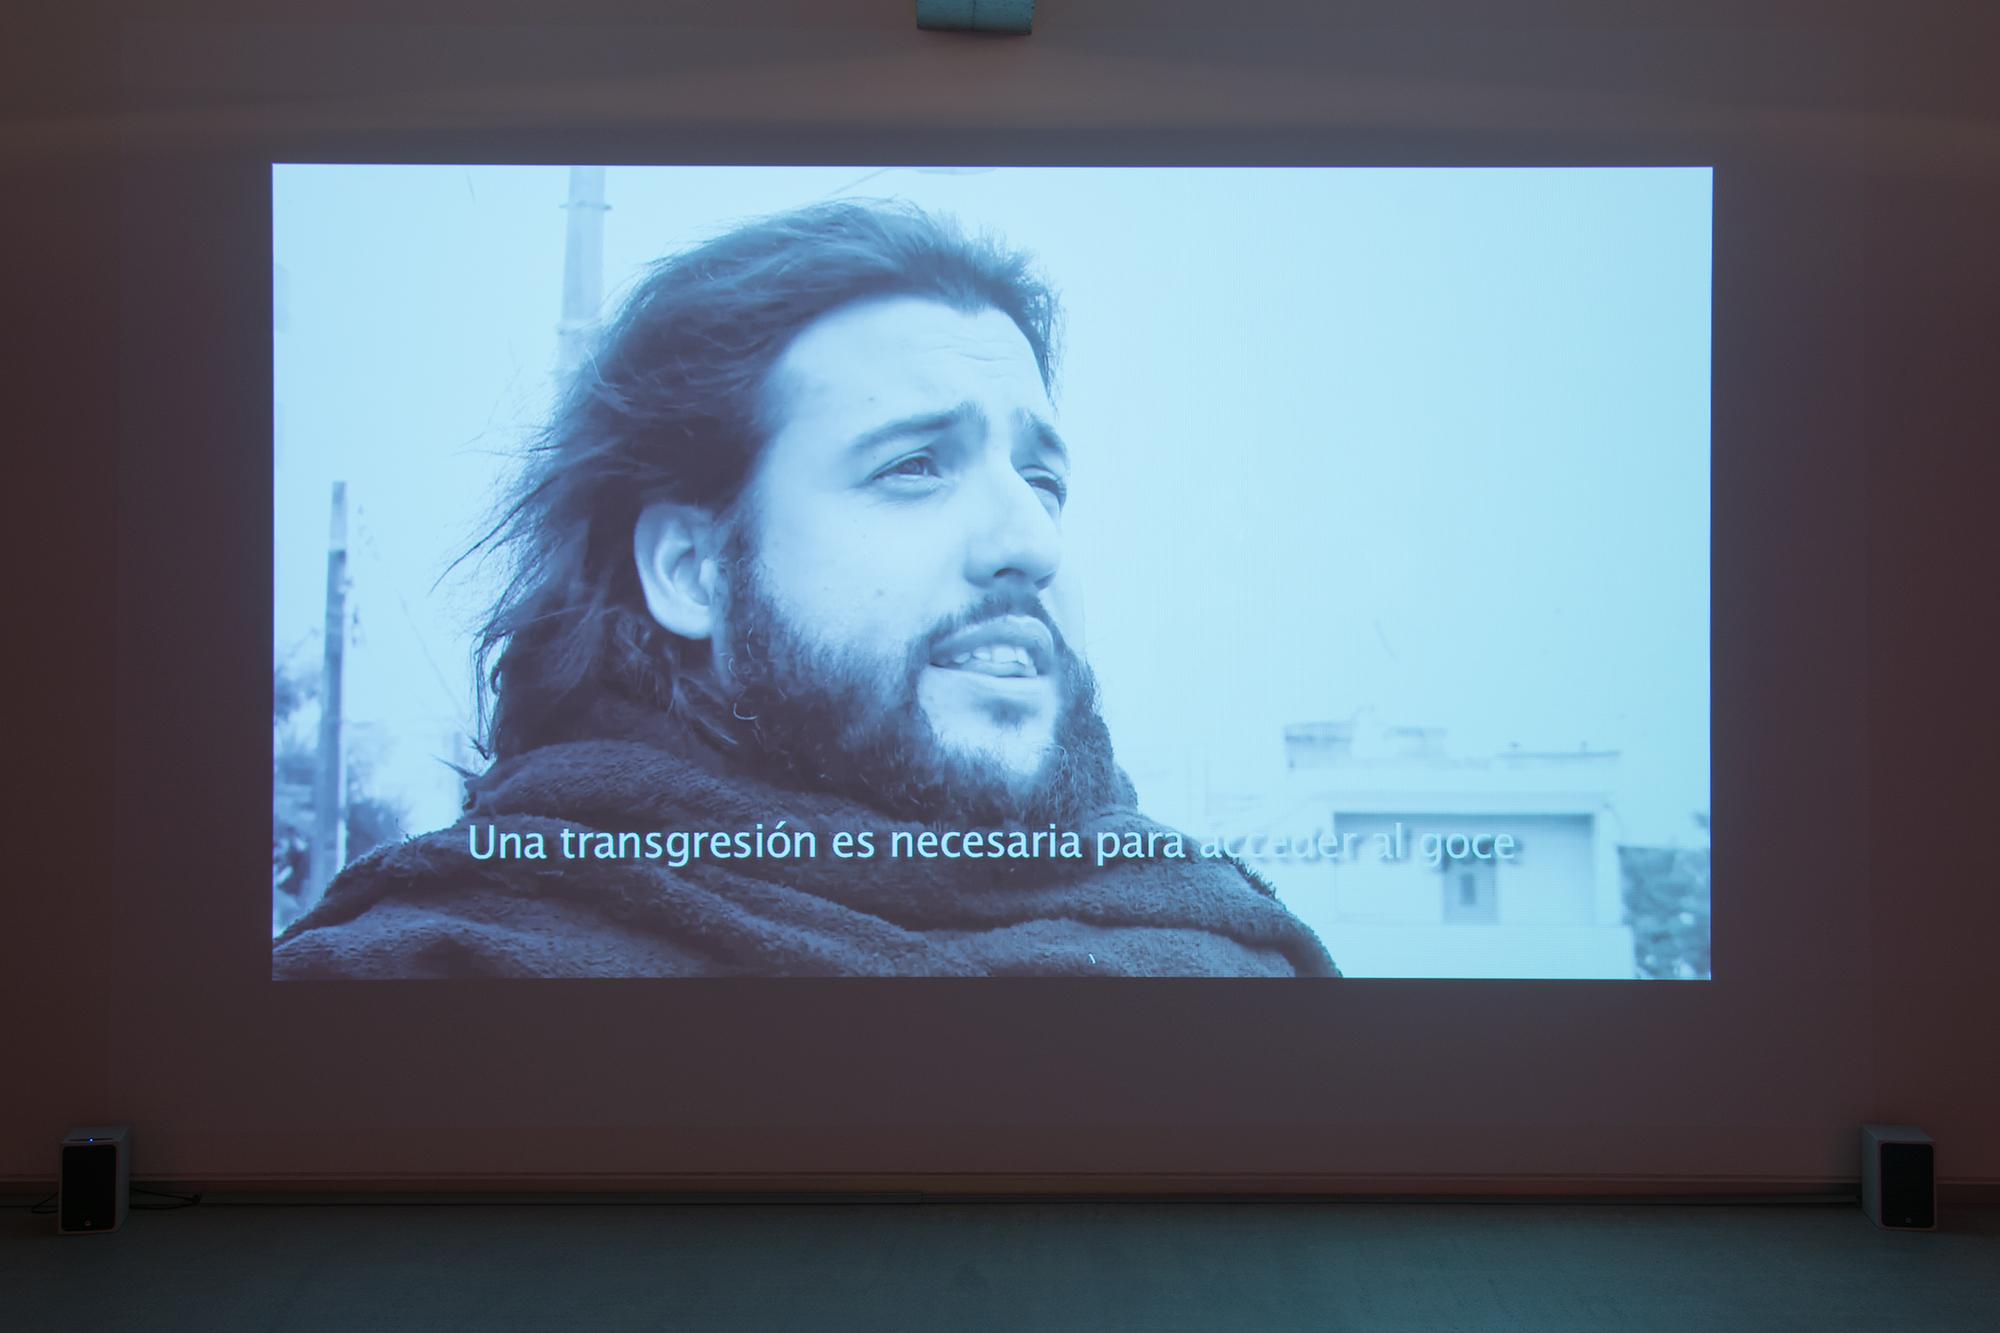 Juan Pérez Agirregoikoa (2016) - Sábado, domingo, sábado